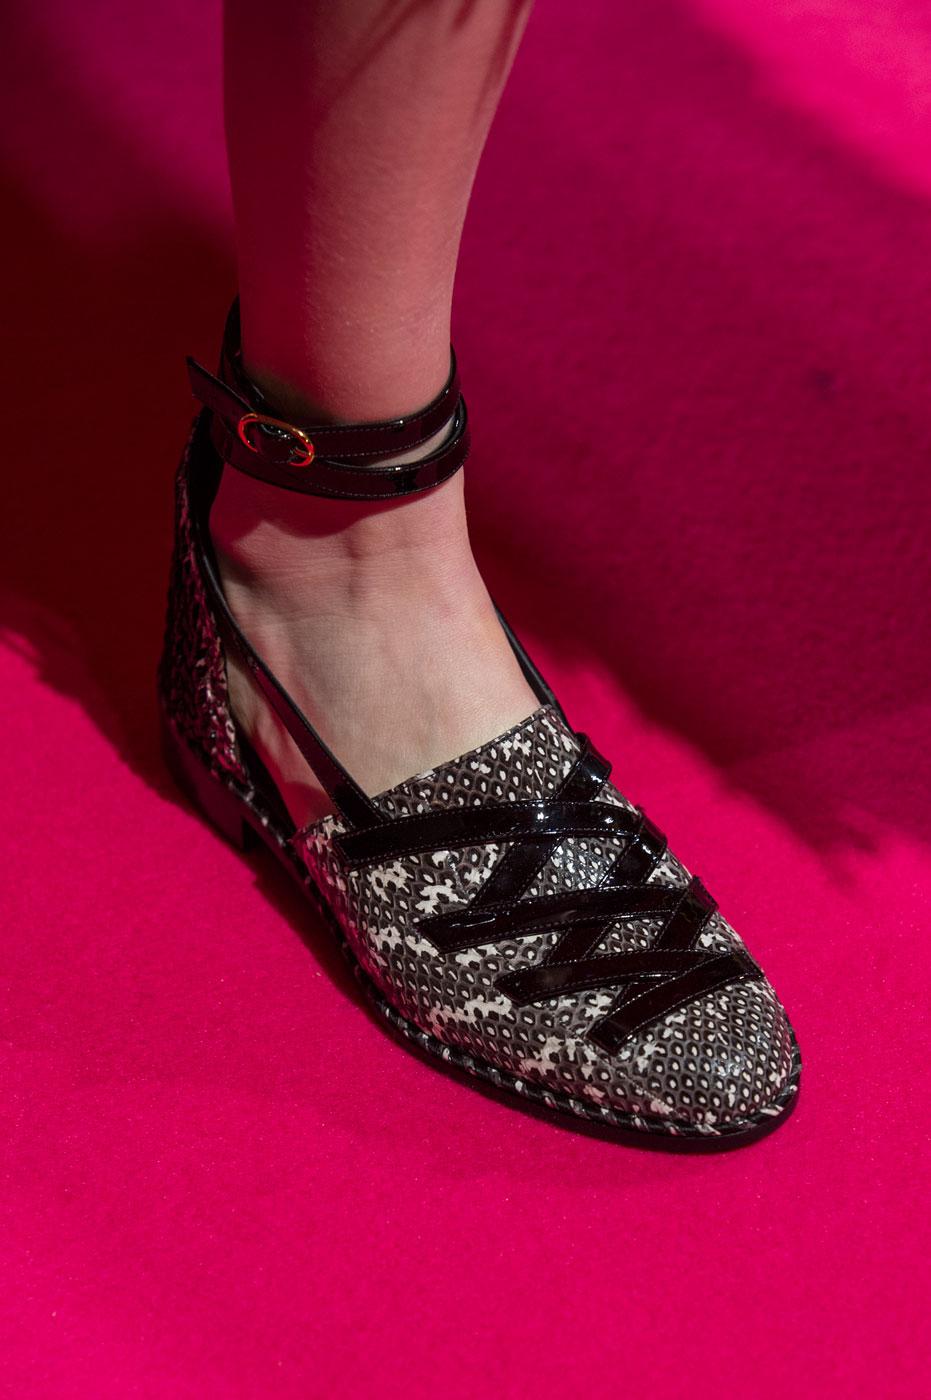 Schiaparelli-fashion-runway-show-close-ups-haute-couture-paris-spring-summer-2015-the-impression-63